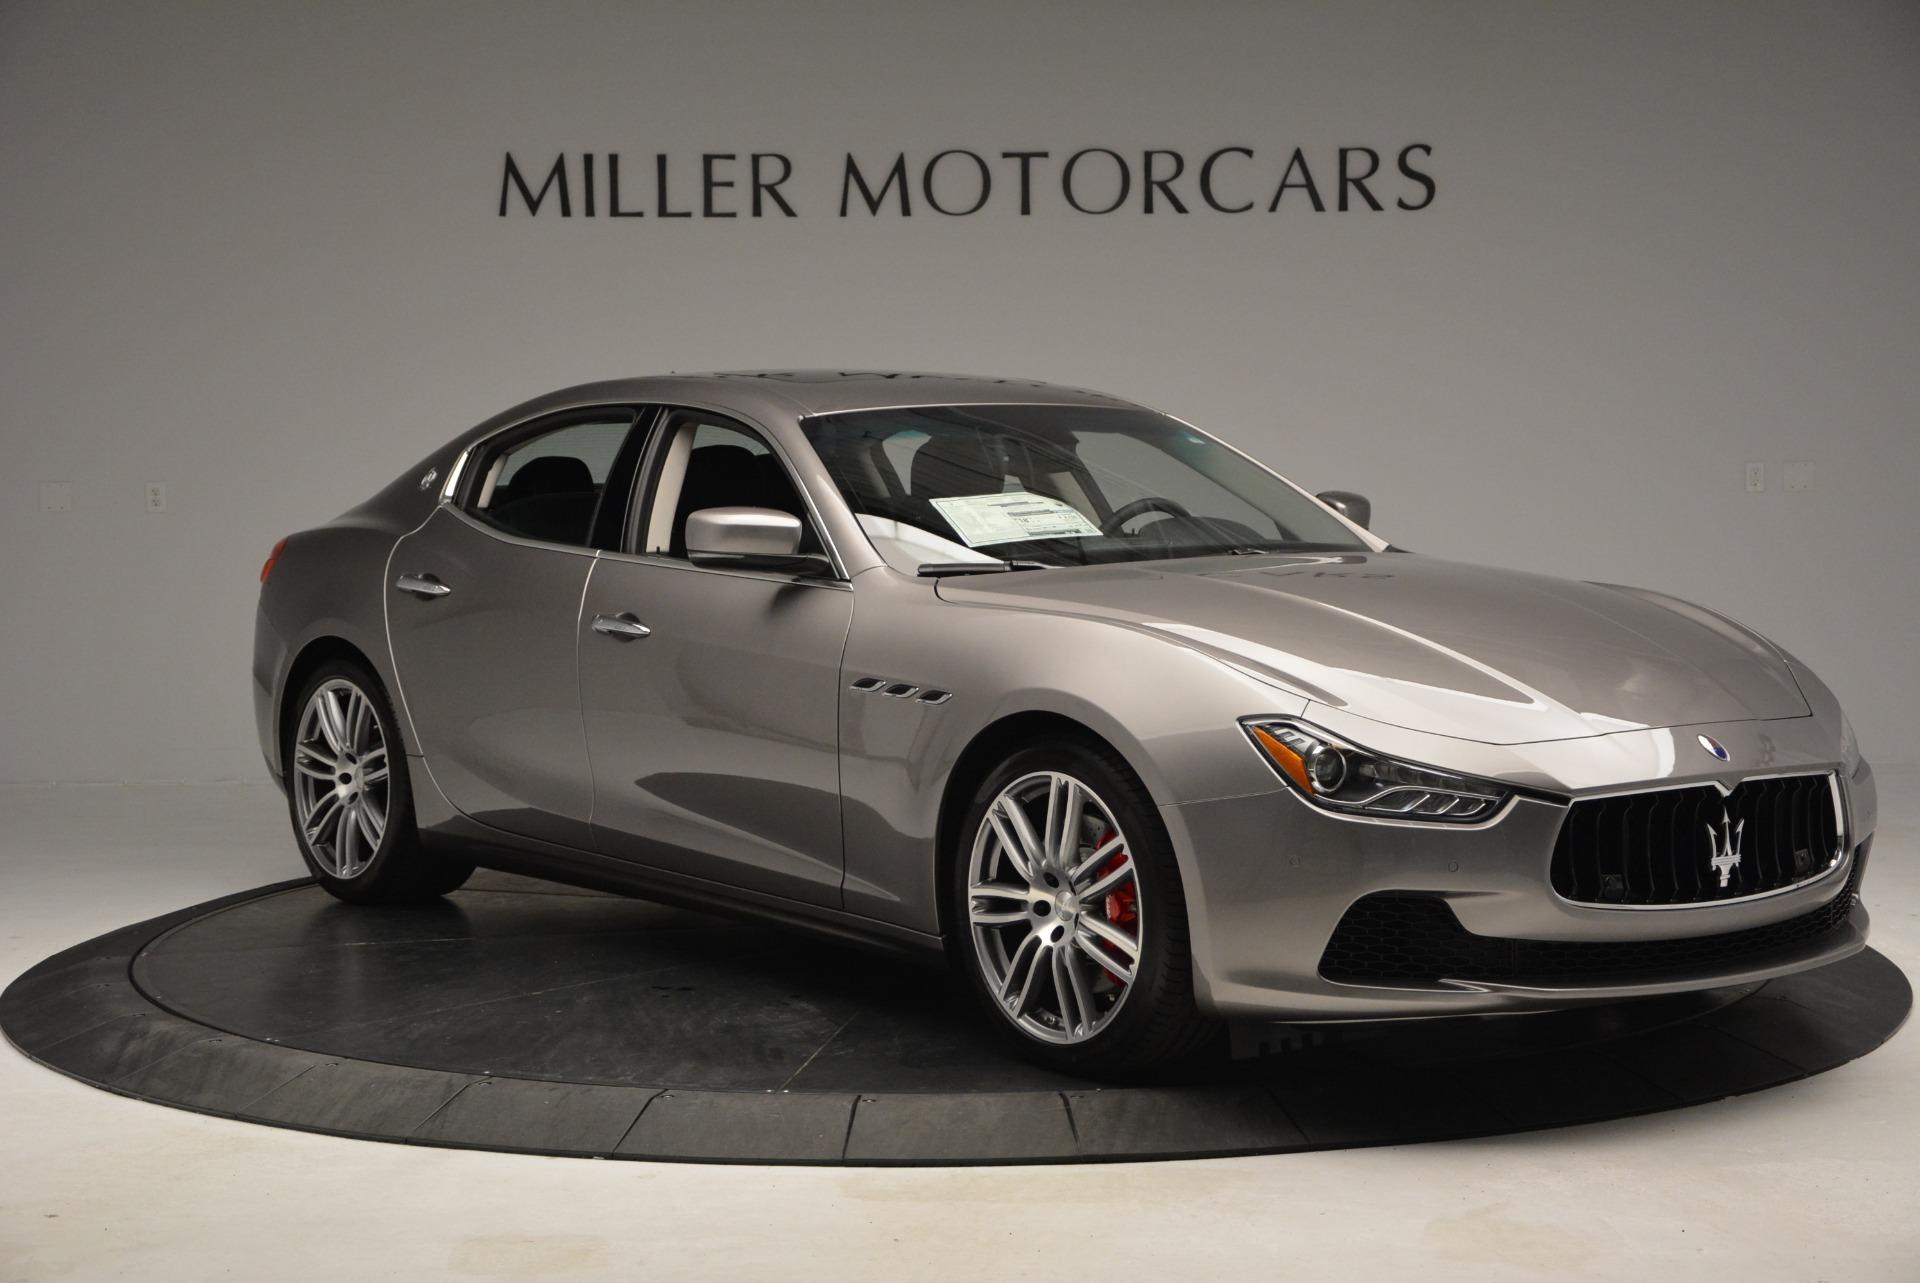 Used 2014 Maserati Ghibli S Q4 For Sale In Greenwich, CT 2562_p11